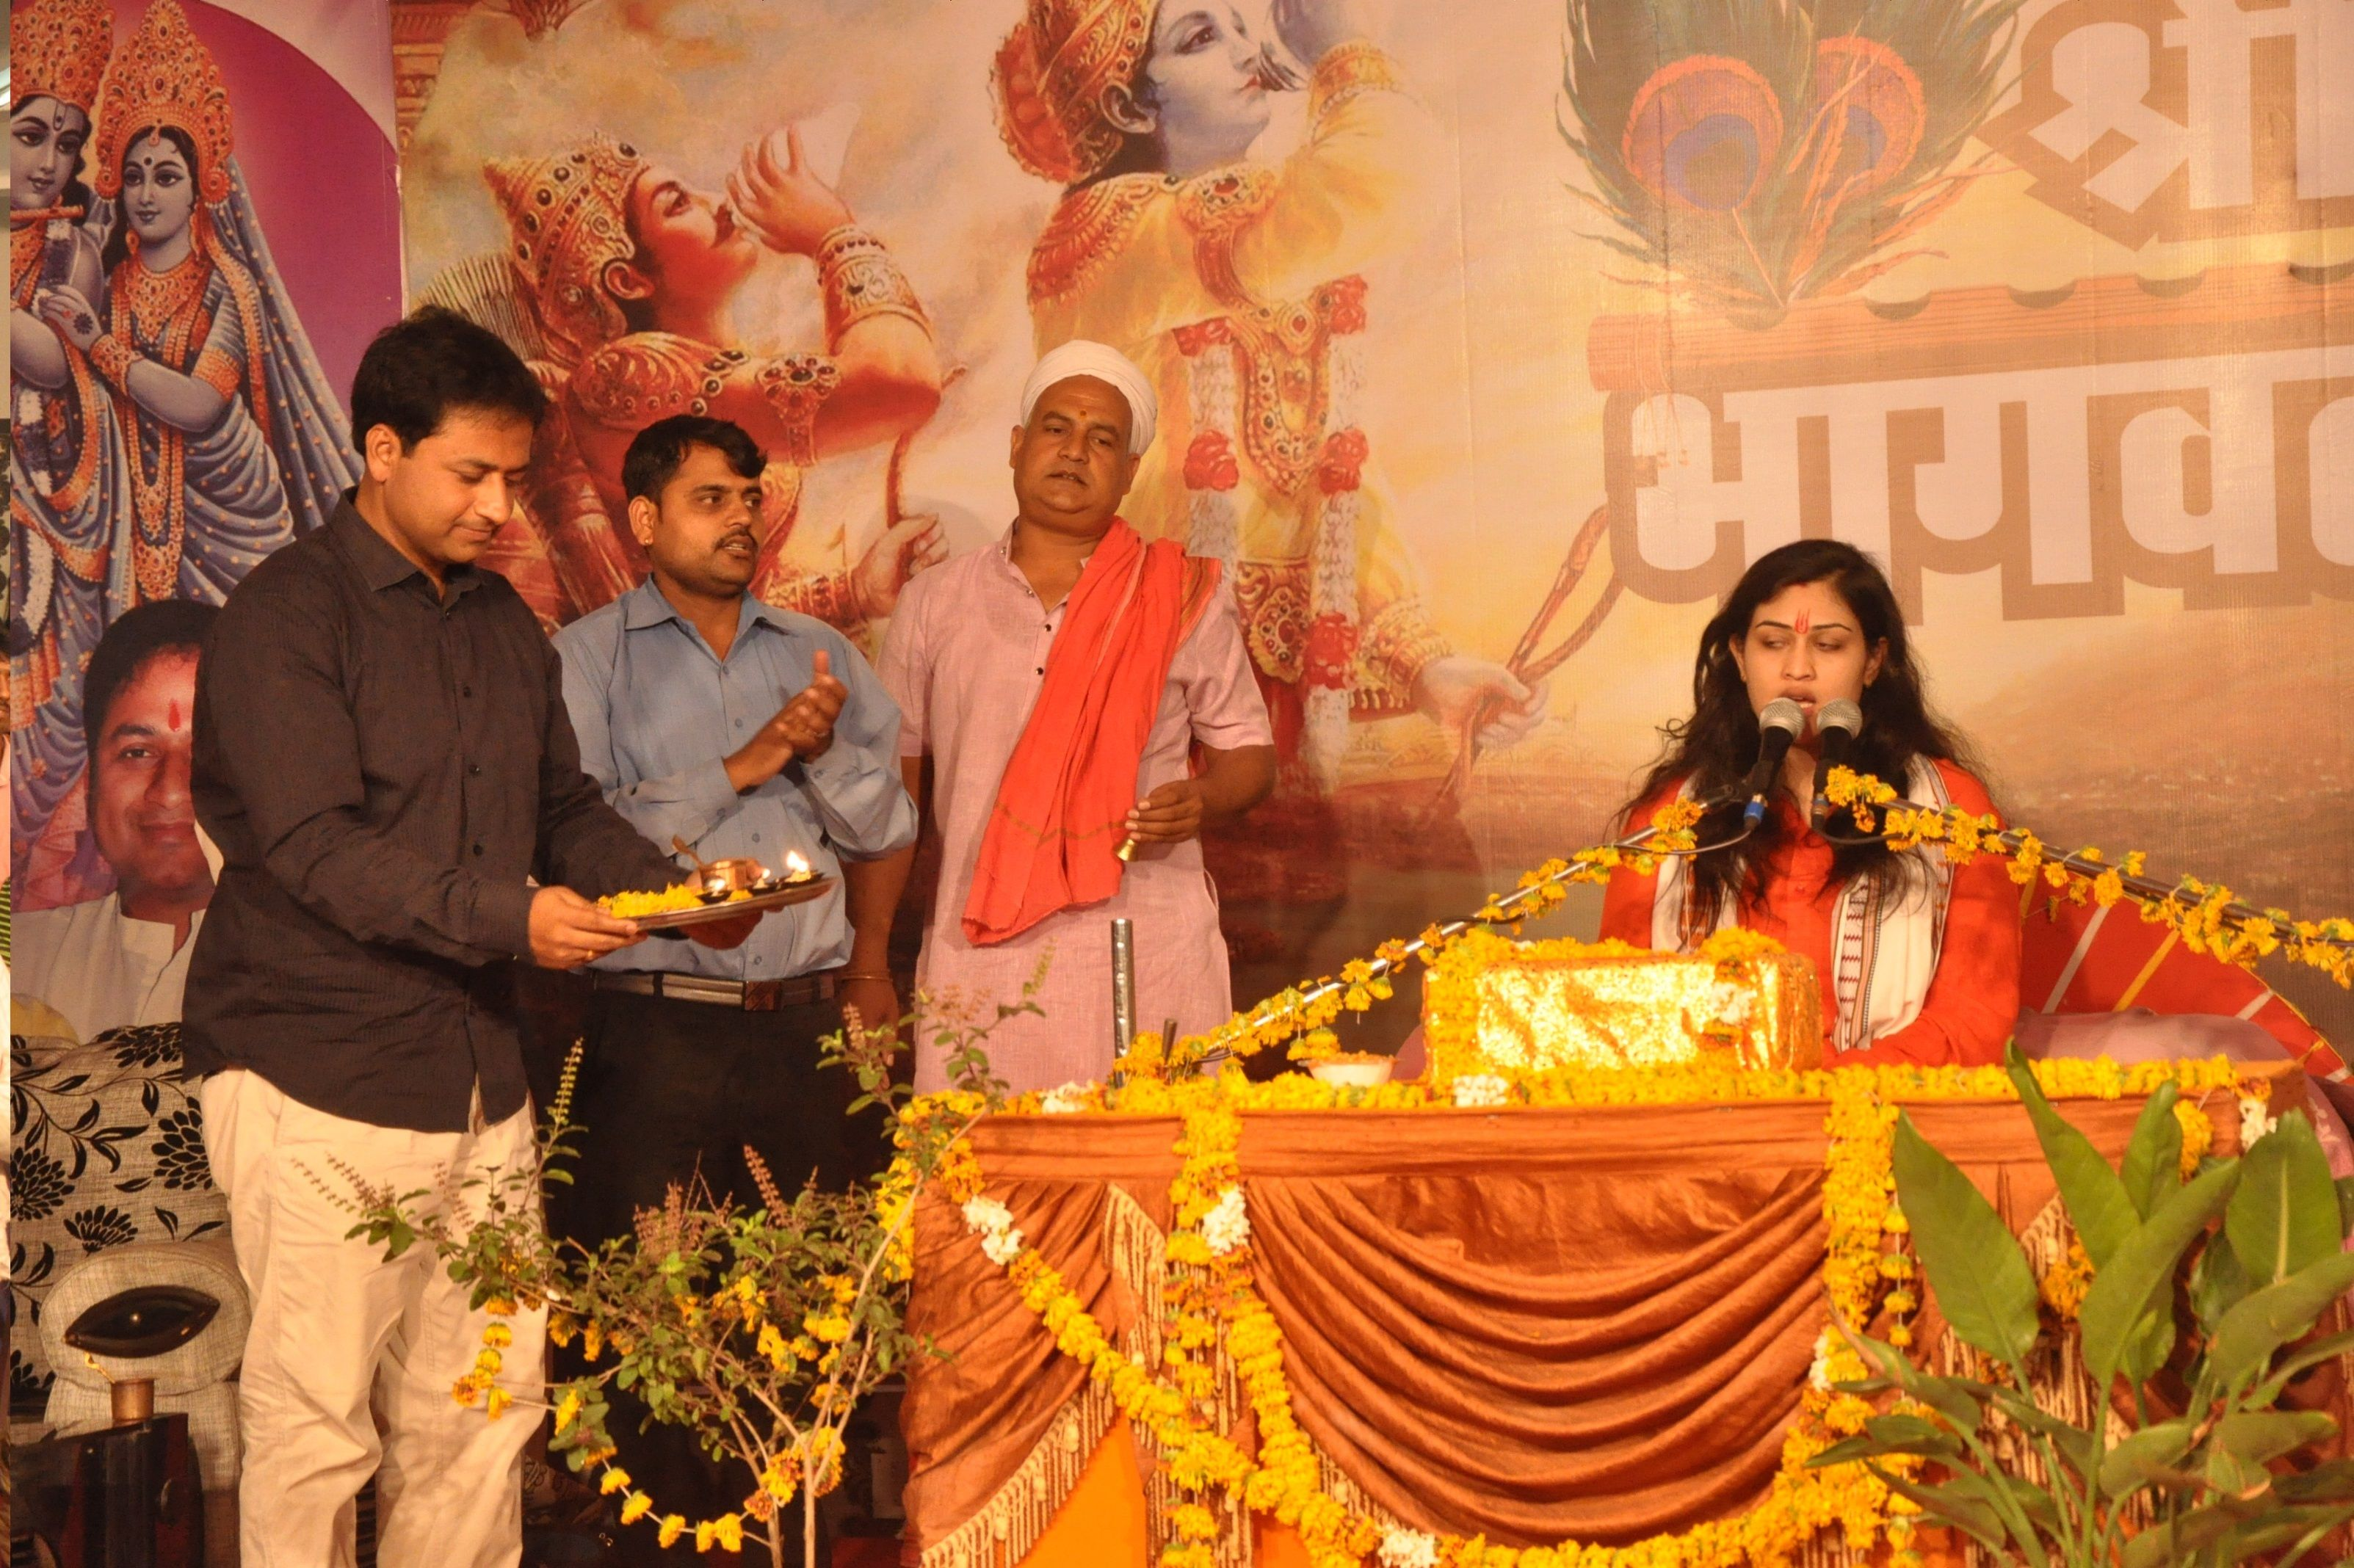 Watch Live telecast of Pujya Prachi Devi ji Bhagwat Katha on